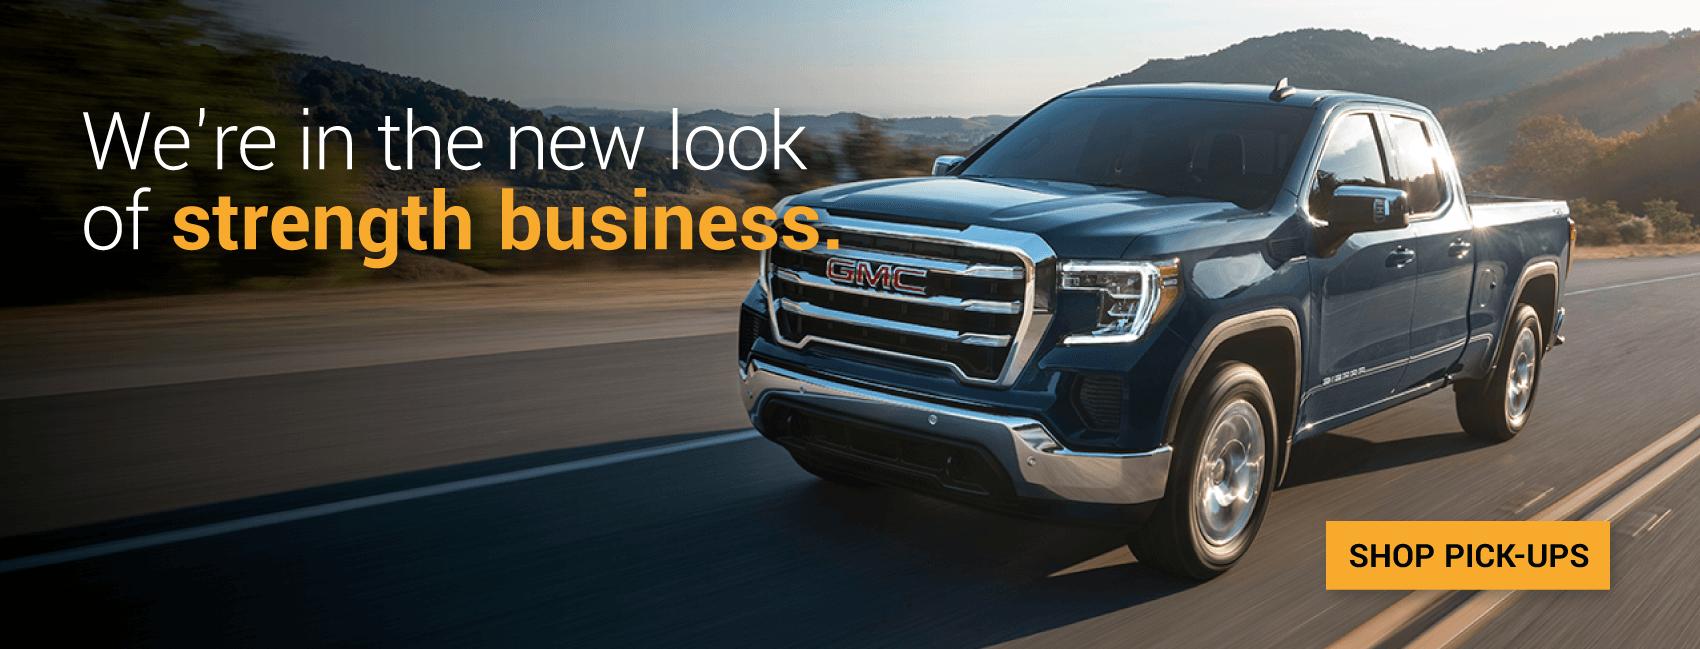 Humberview Trucks Pickup Trucks, GMC, Ford, Dealer